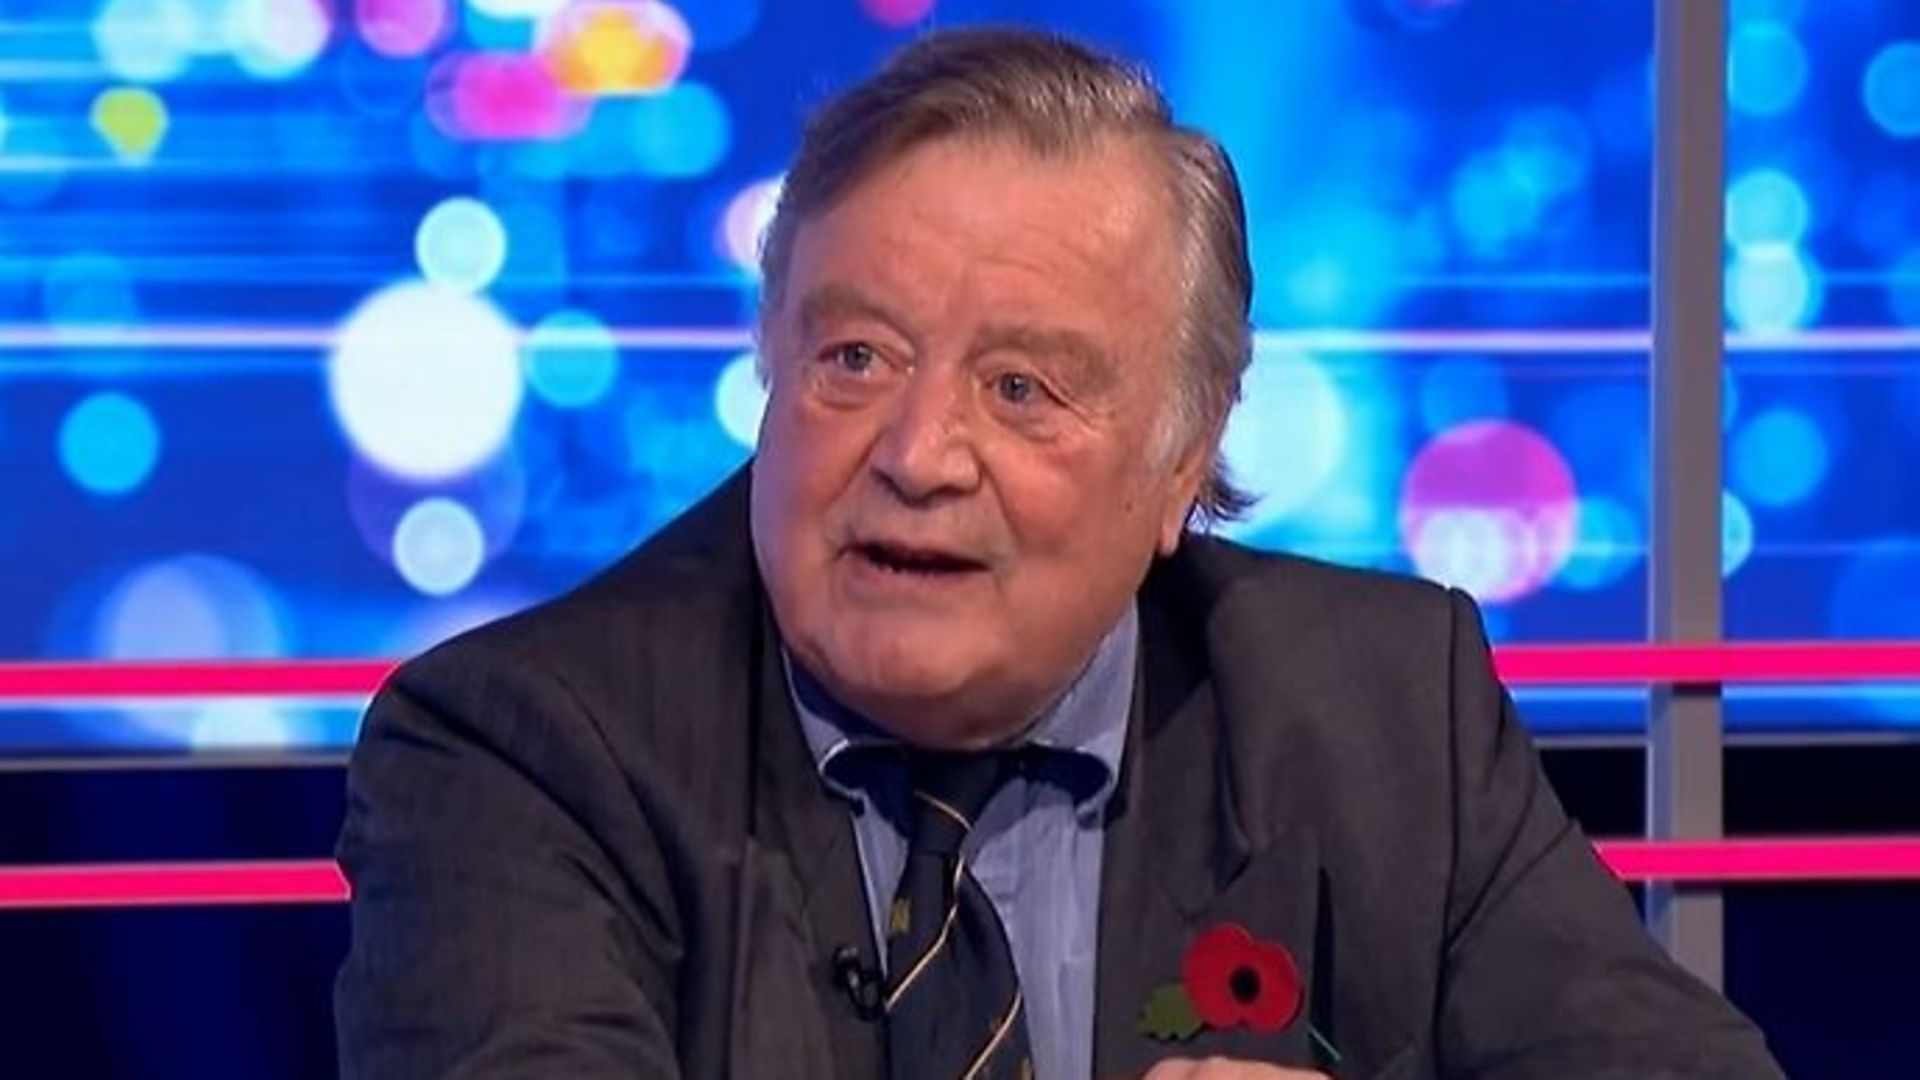 Former Conservative chancellor Ken Clarke on ITV's Peston show - Credit: Twitter